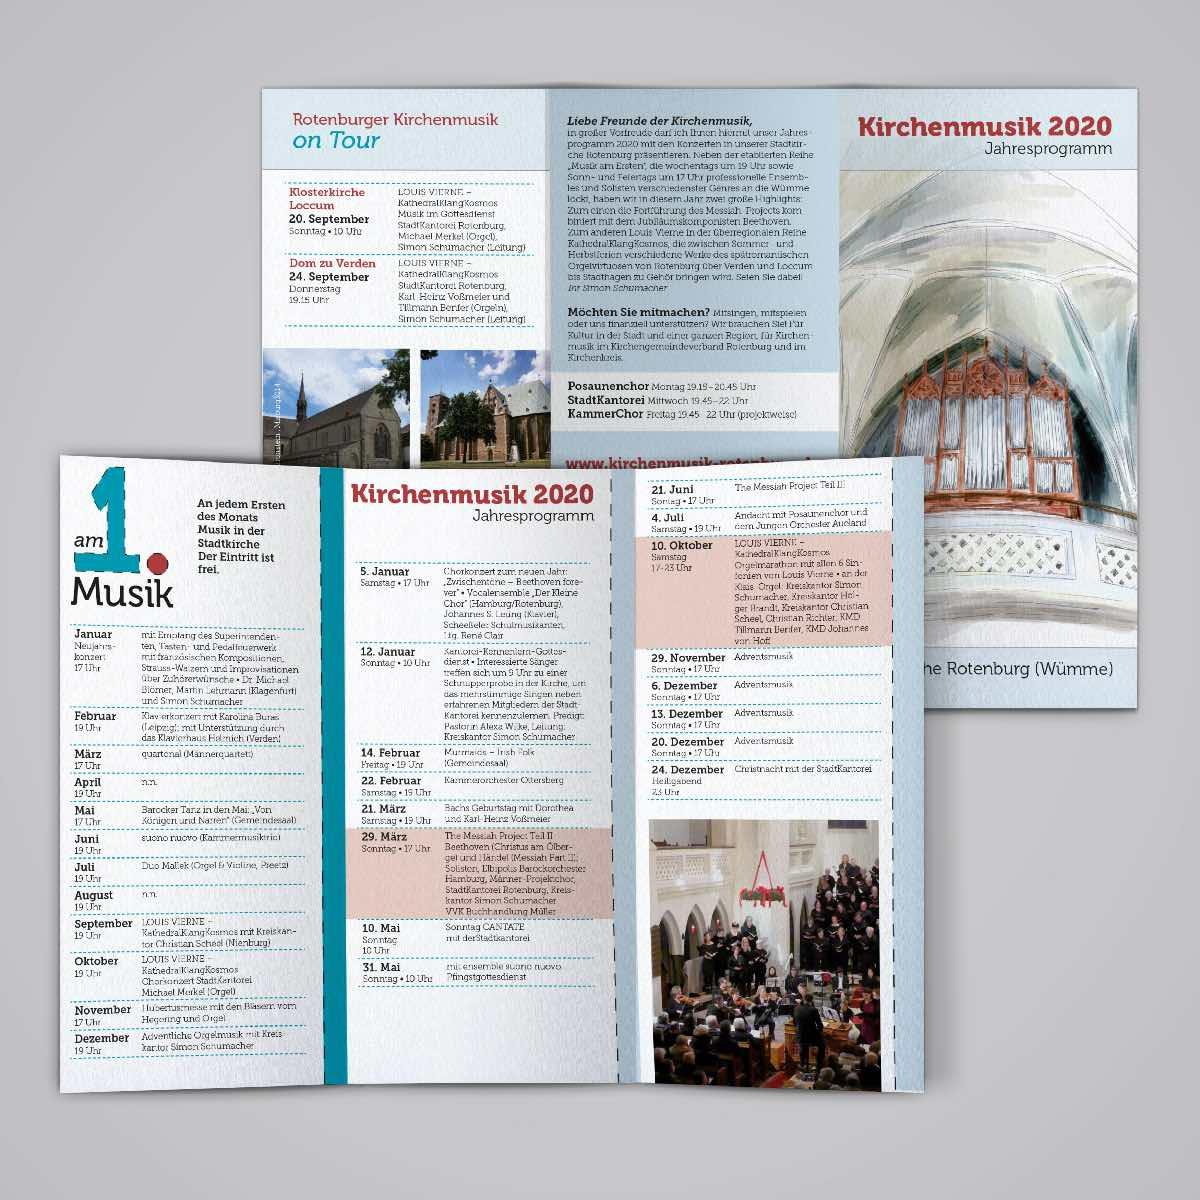 Programm Kirchenmusik Flyer Rotenburg